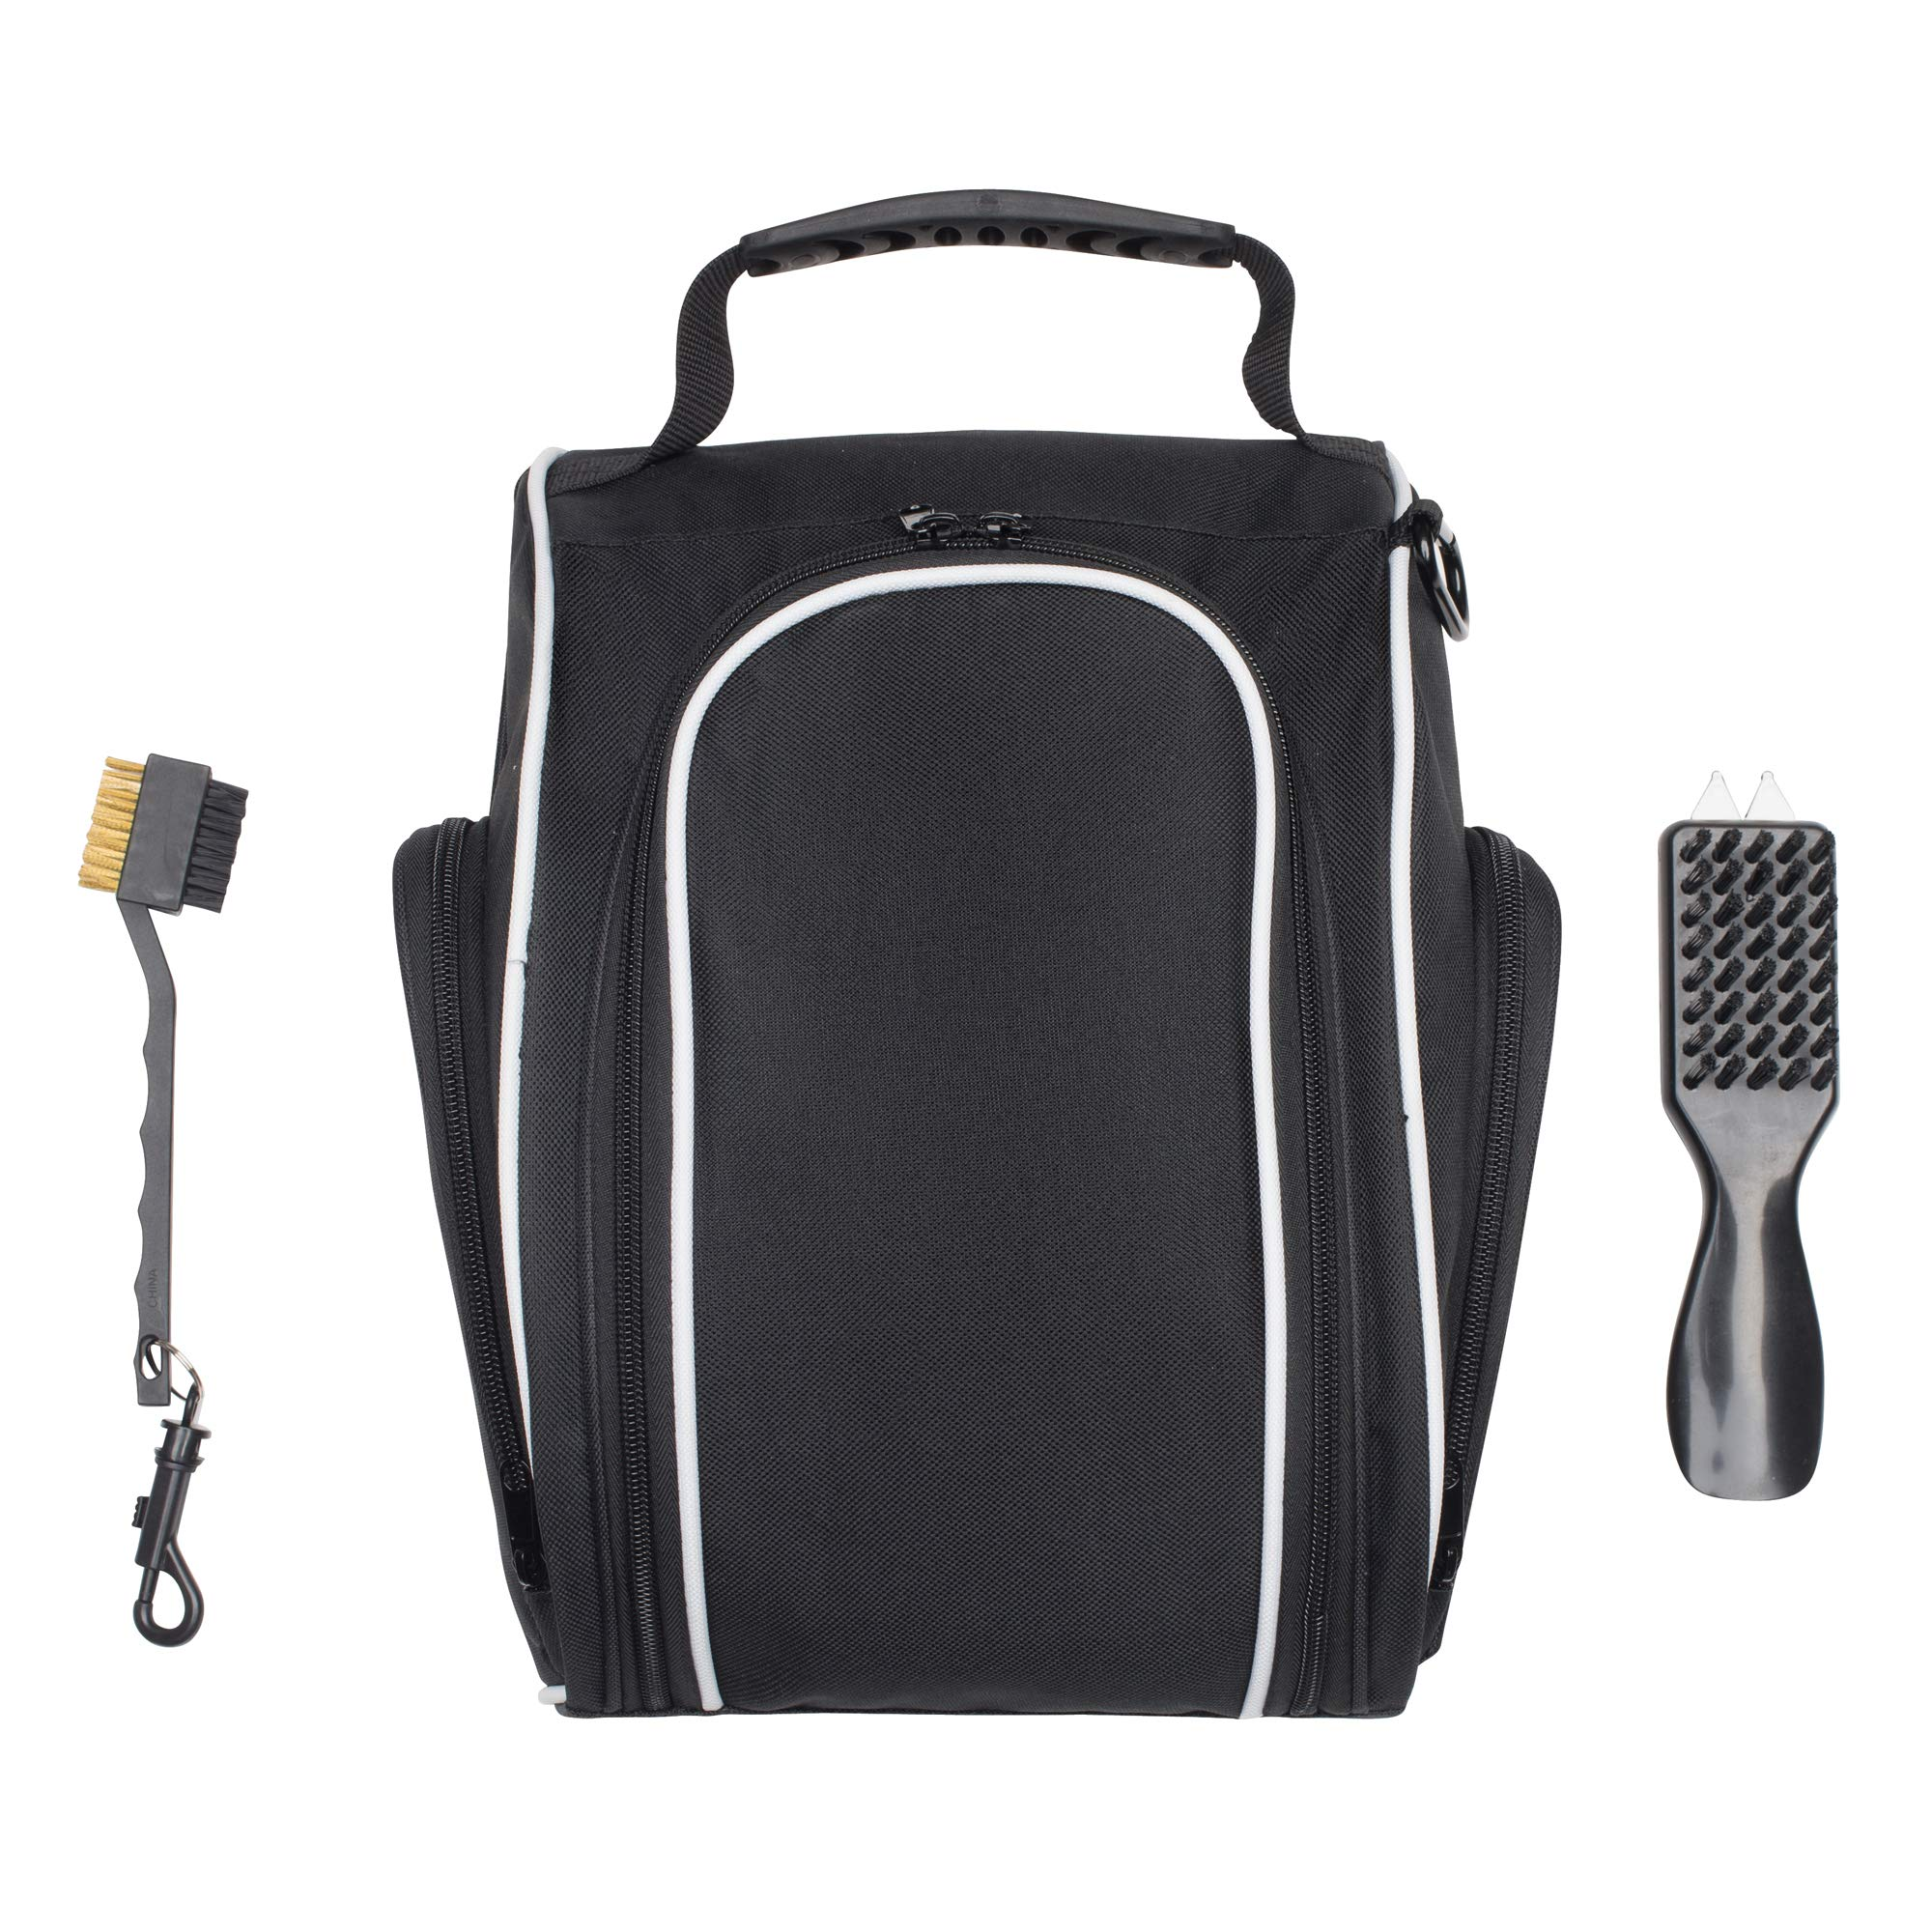 DesignWorks Golf Shoe Bag Tote for Men and Women, Hanging Clip and Large Zippered Side-Pockets, includes Golf Accessories Bonus by DesignWorks